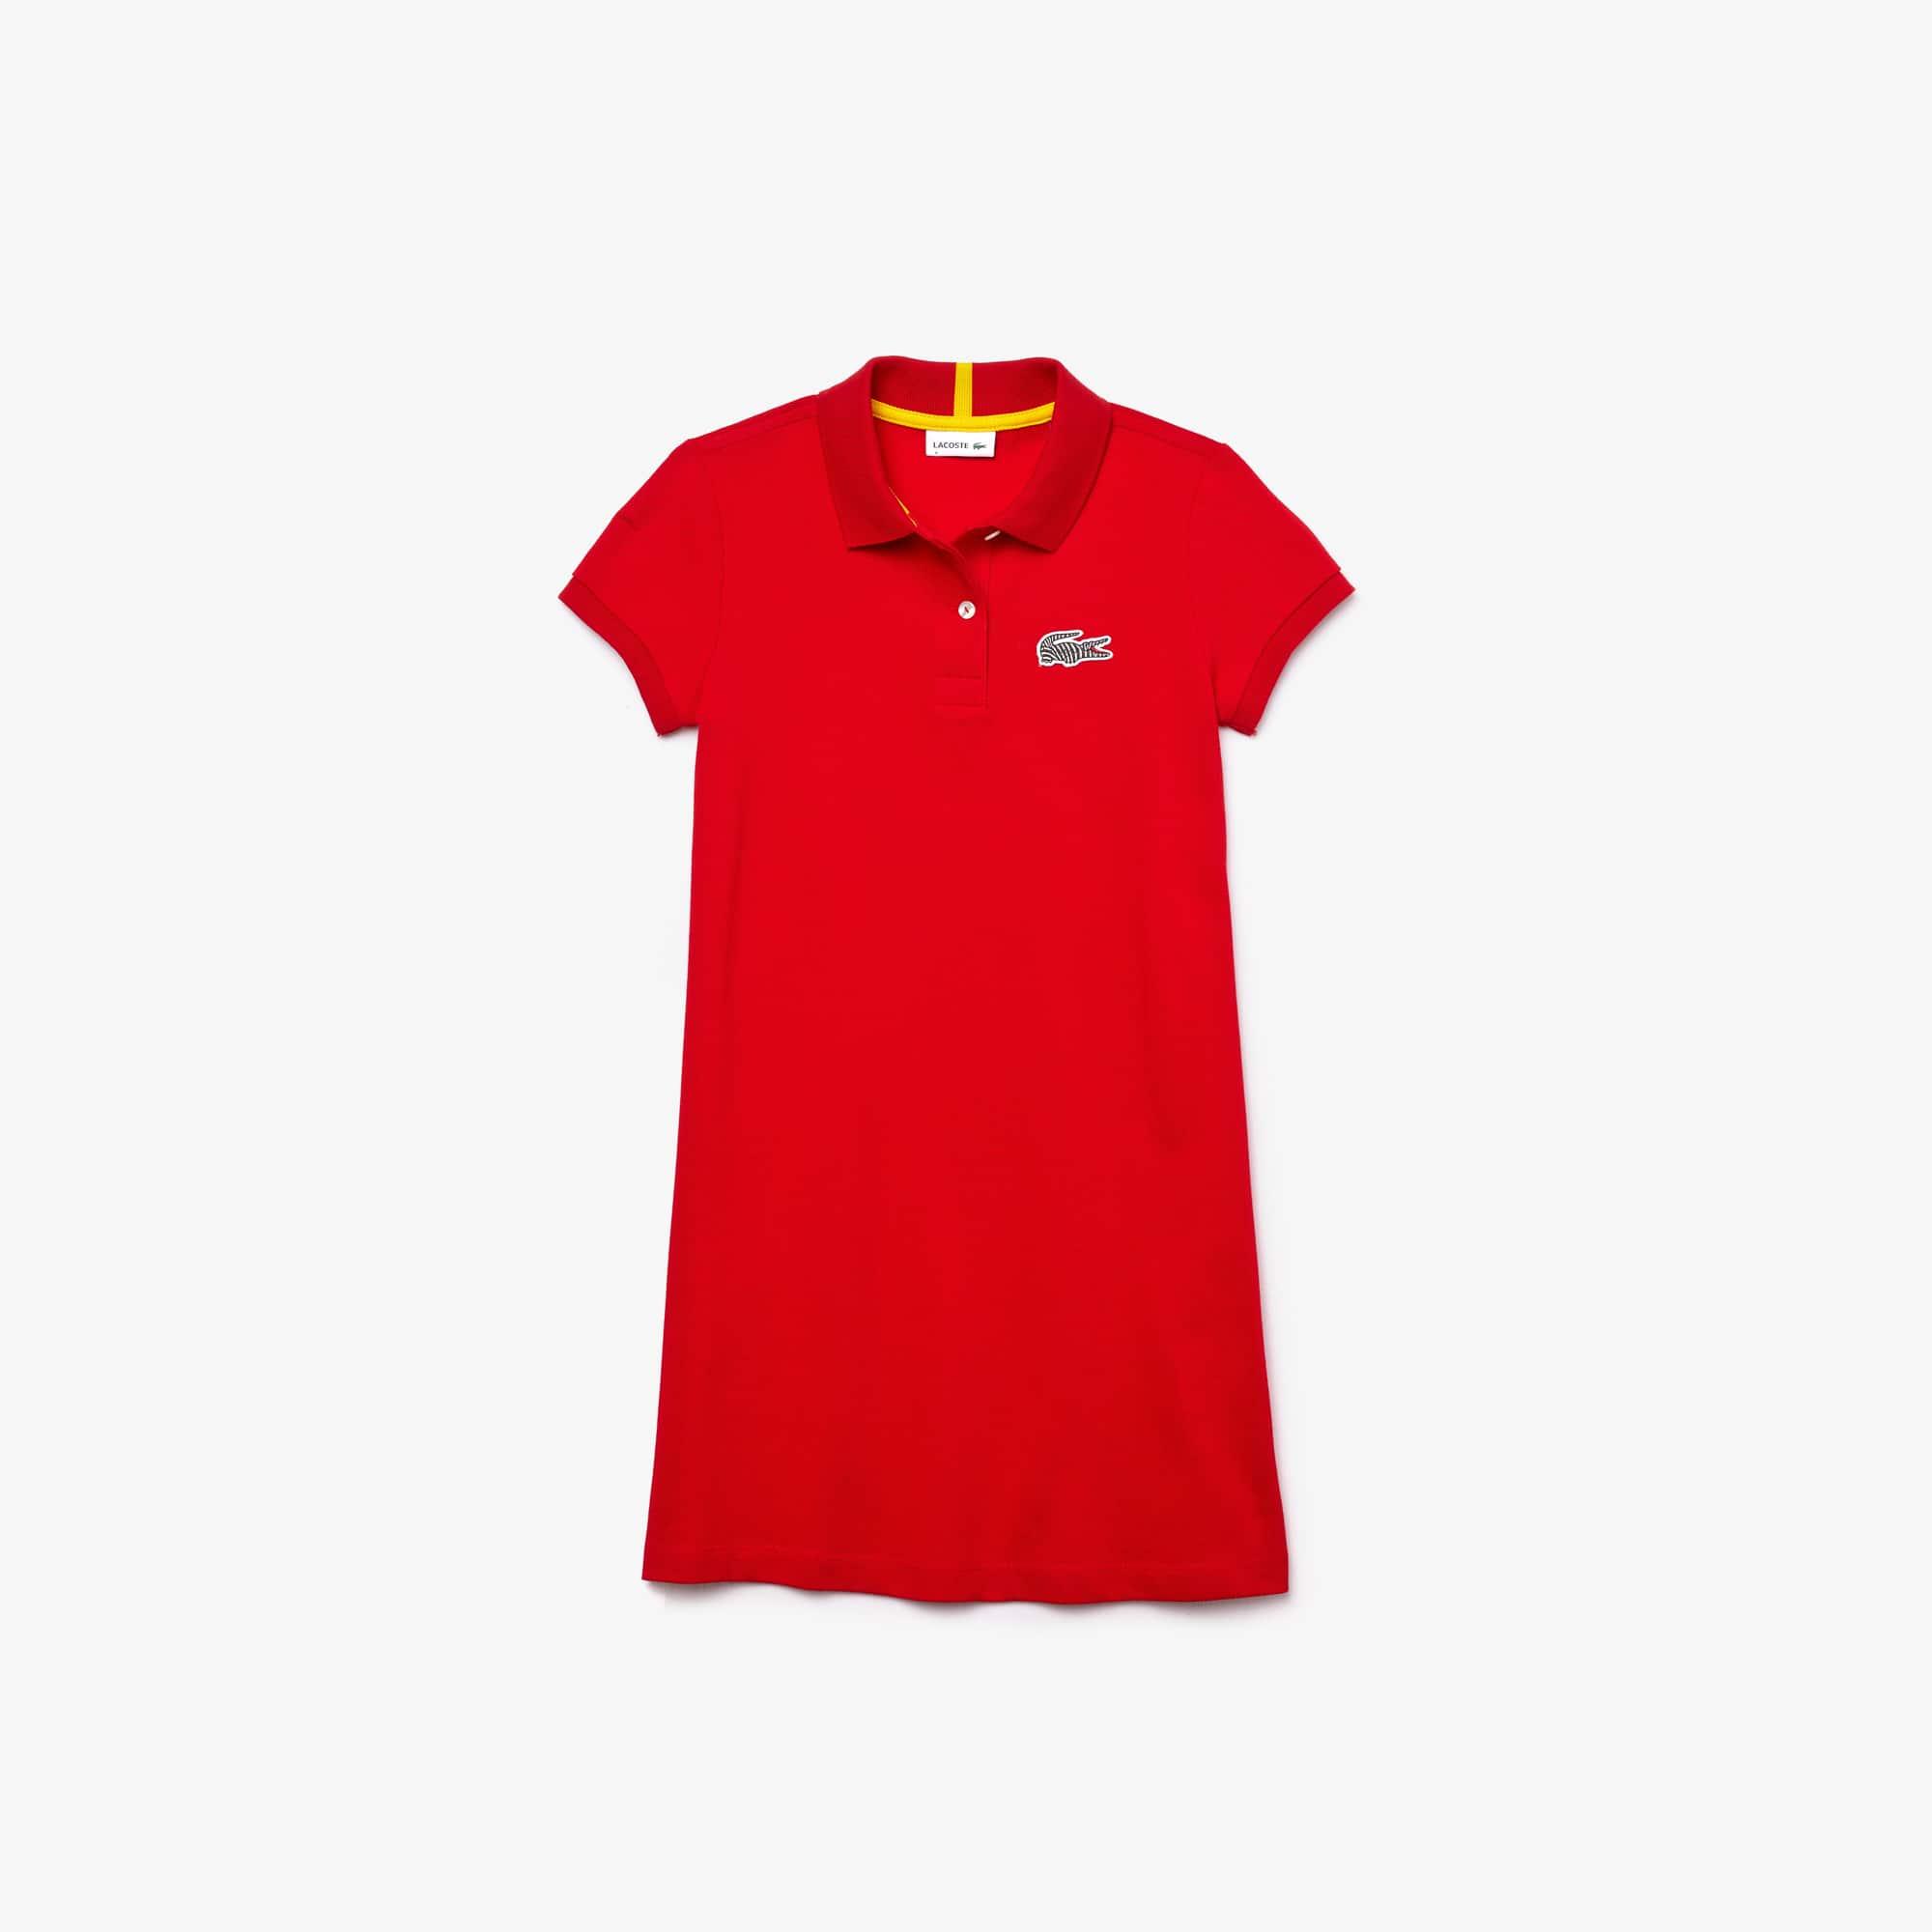 Girls' Lacoste x National Geographic Cotton Piqué Polo Shirt Dress